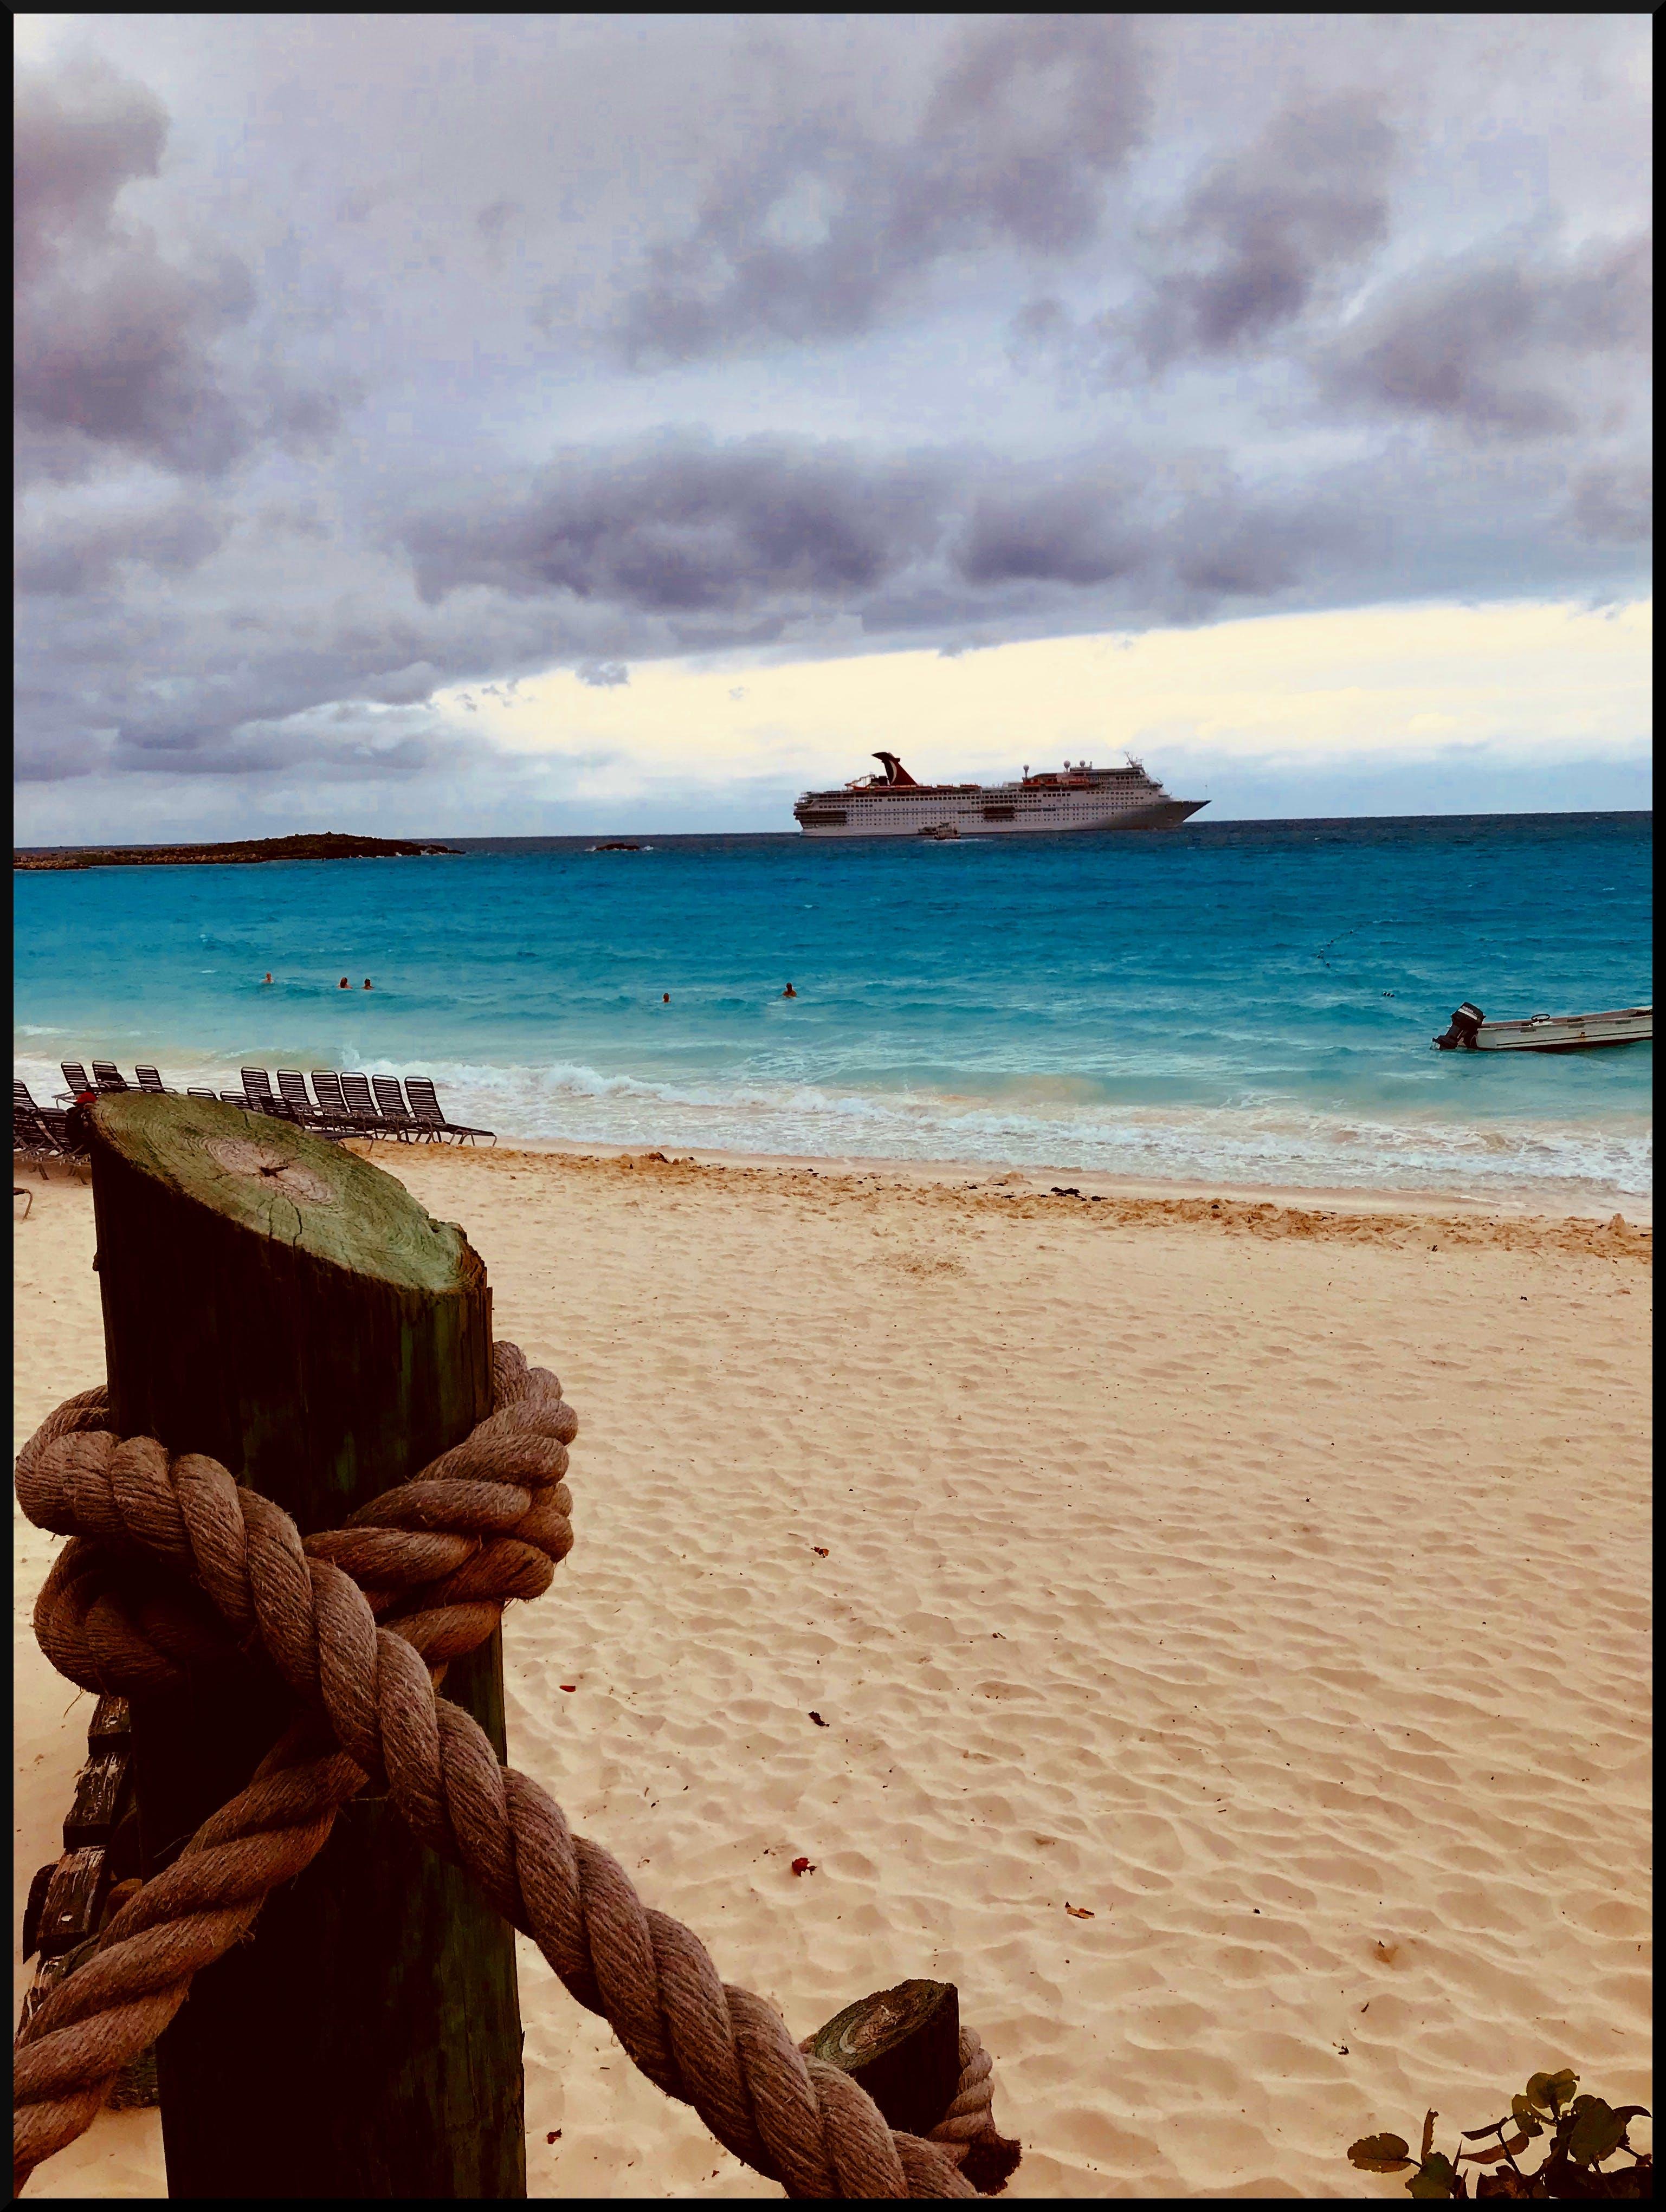 Free stock photo of beach, Carnival Cruise, cruise ship, Half Moon Cay